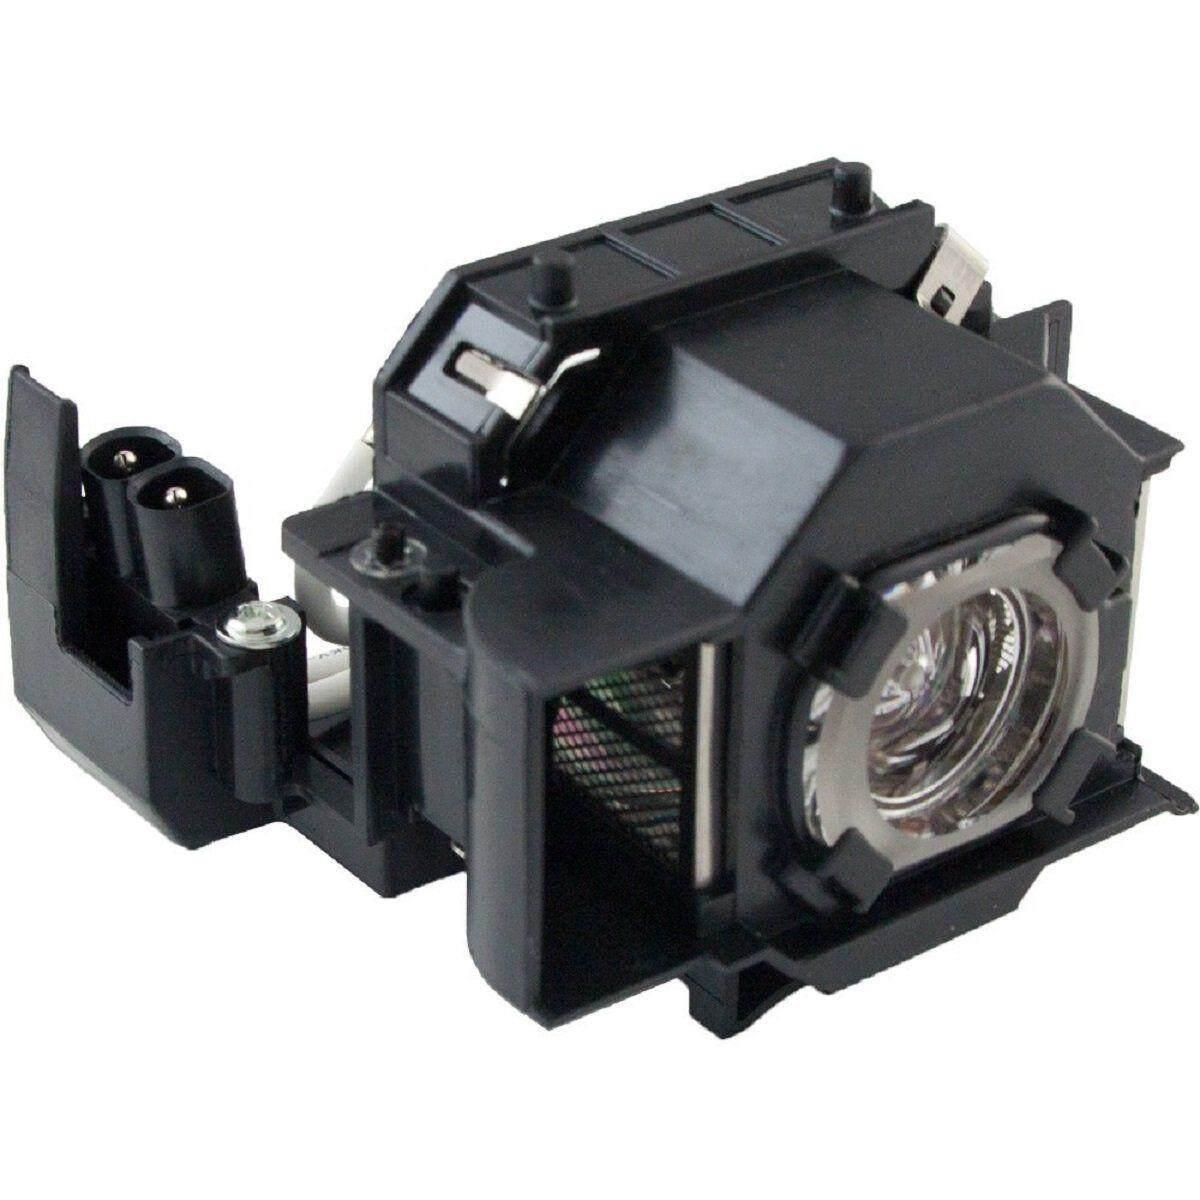 Uhe-170e-c Lampu Proyektor Bohlam ELPLP34 V13H010L34 untuk Epson Powerlight 76C 82C EMP